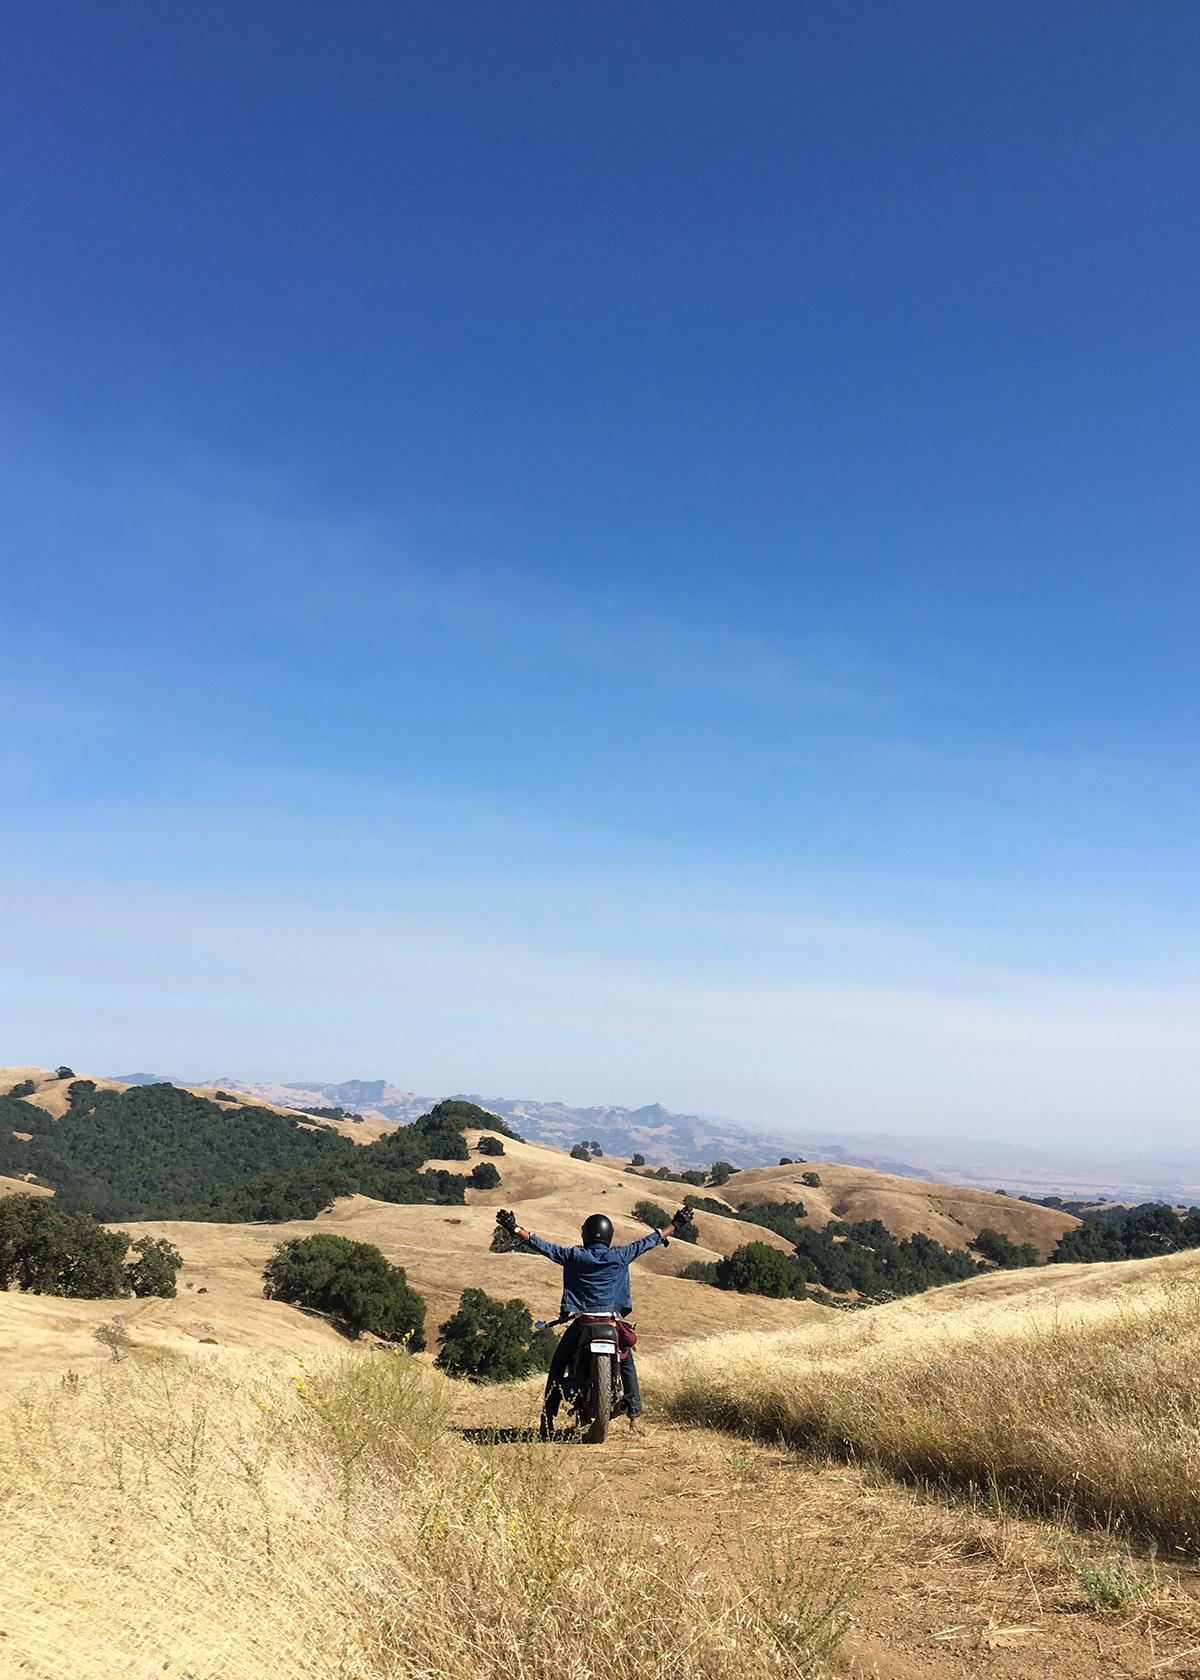 Niroshan Amarasiriwardena riding his Honda CB in the back country california